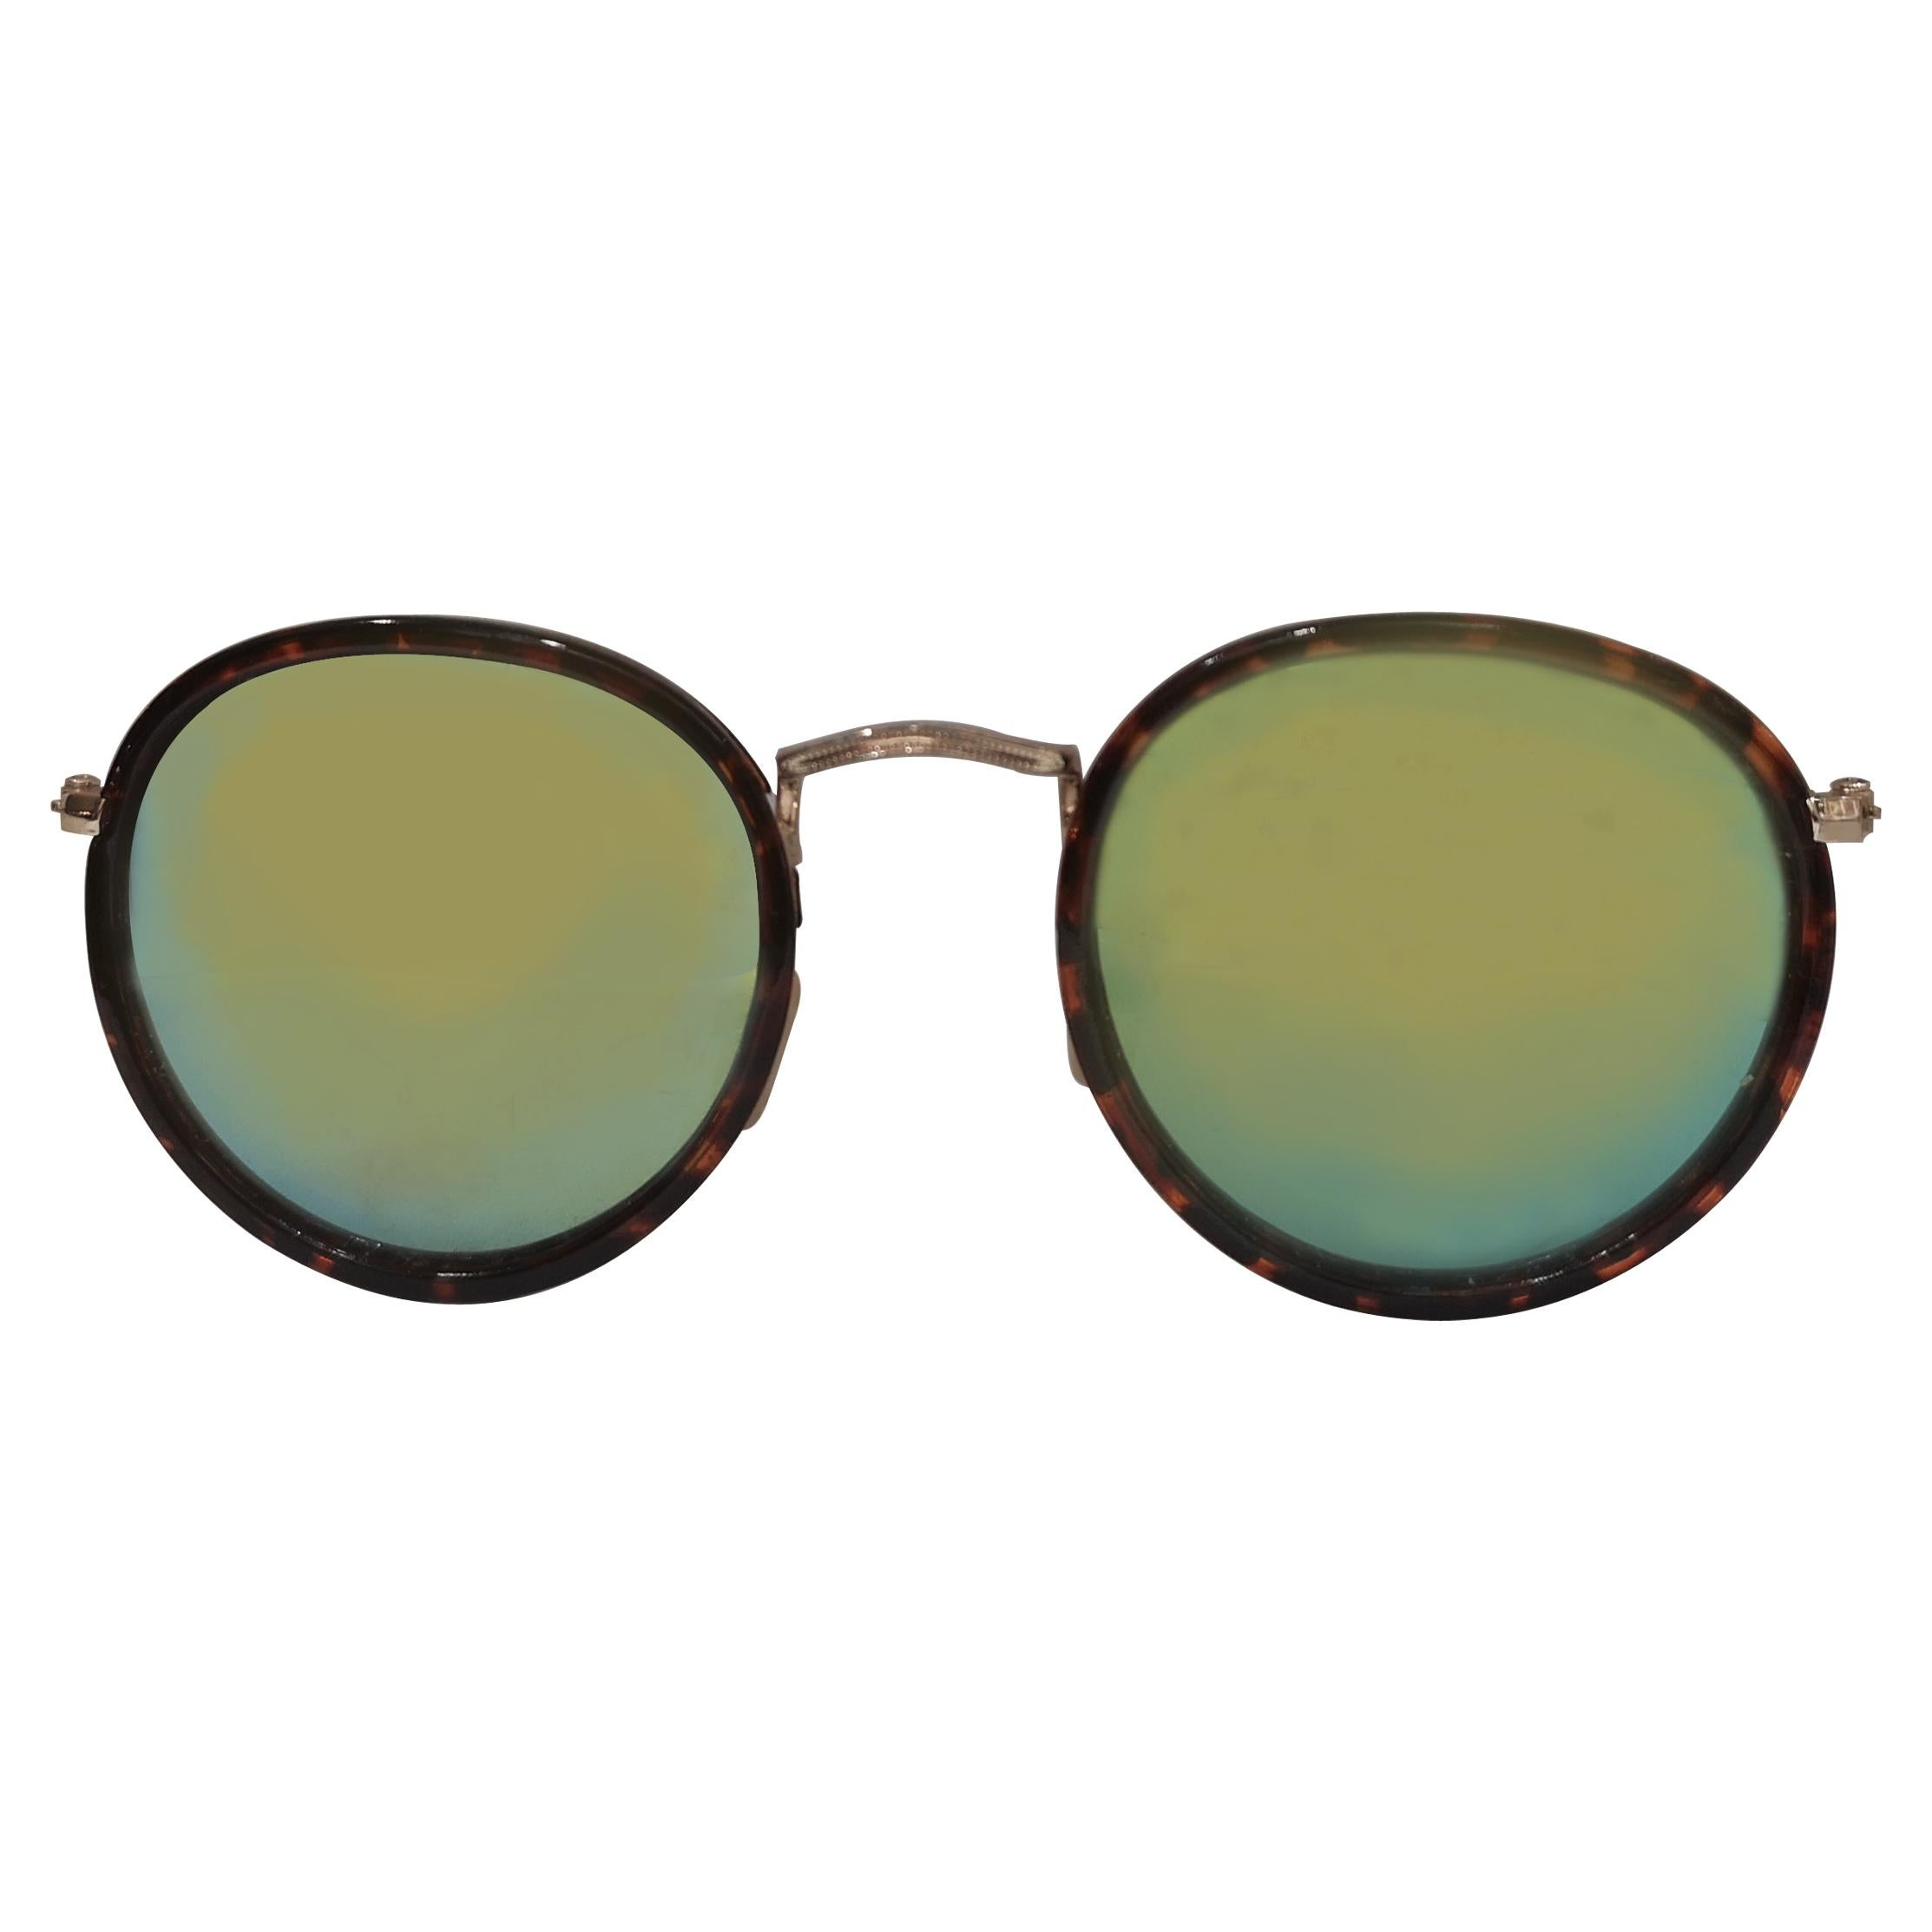 Vintage tortoise green mirrored lens sunglasses